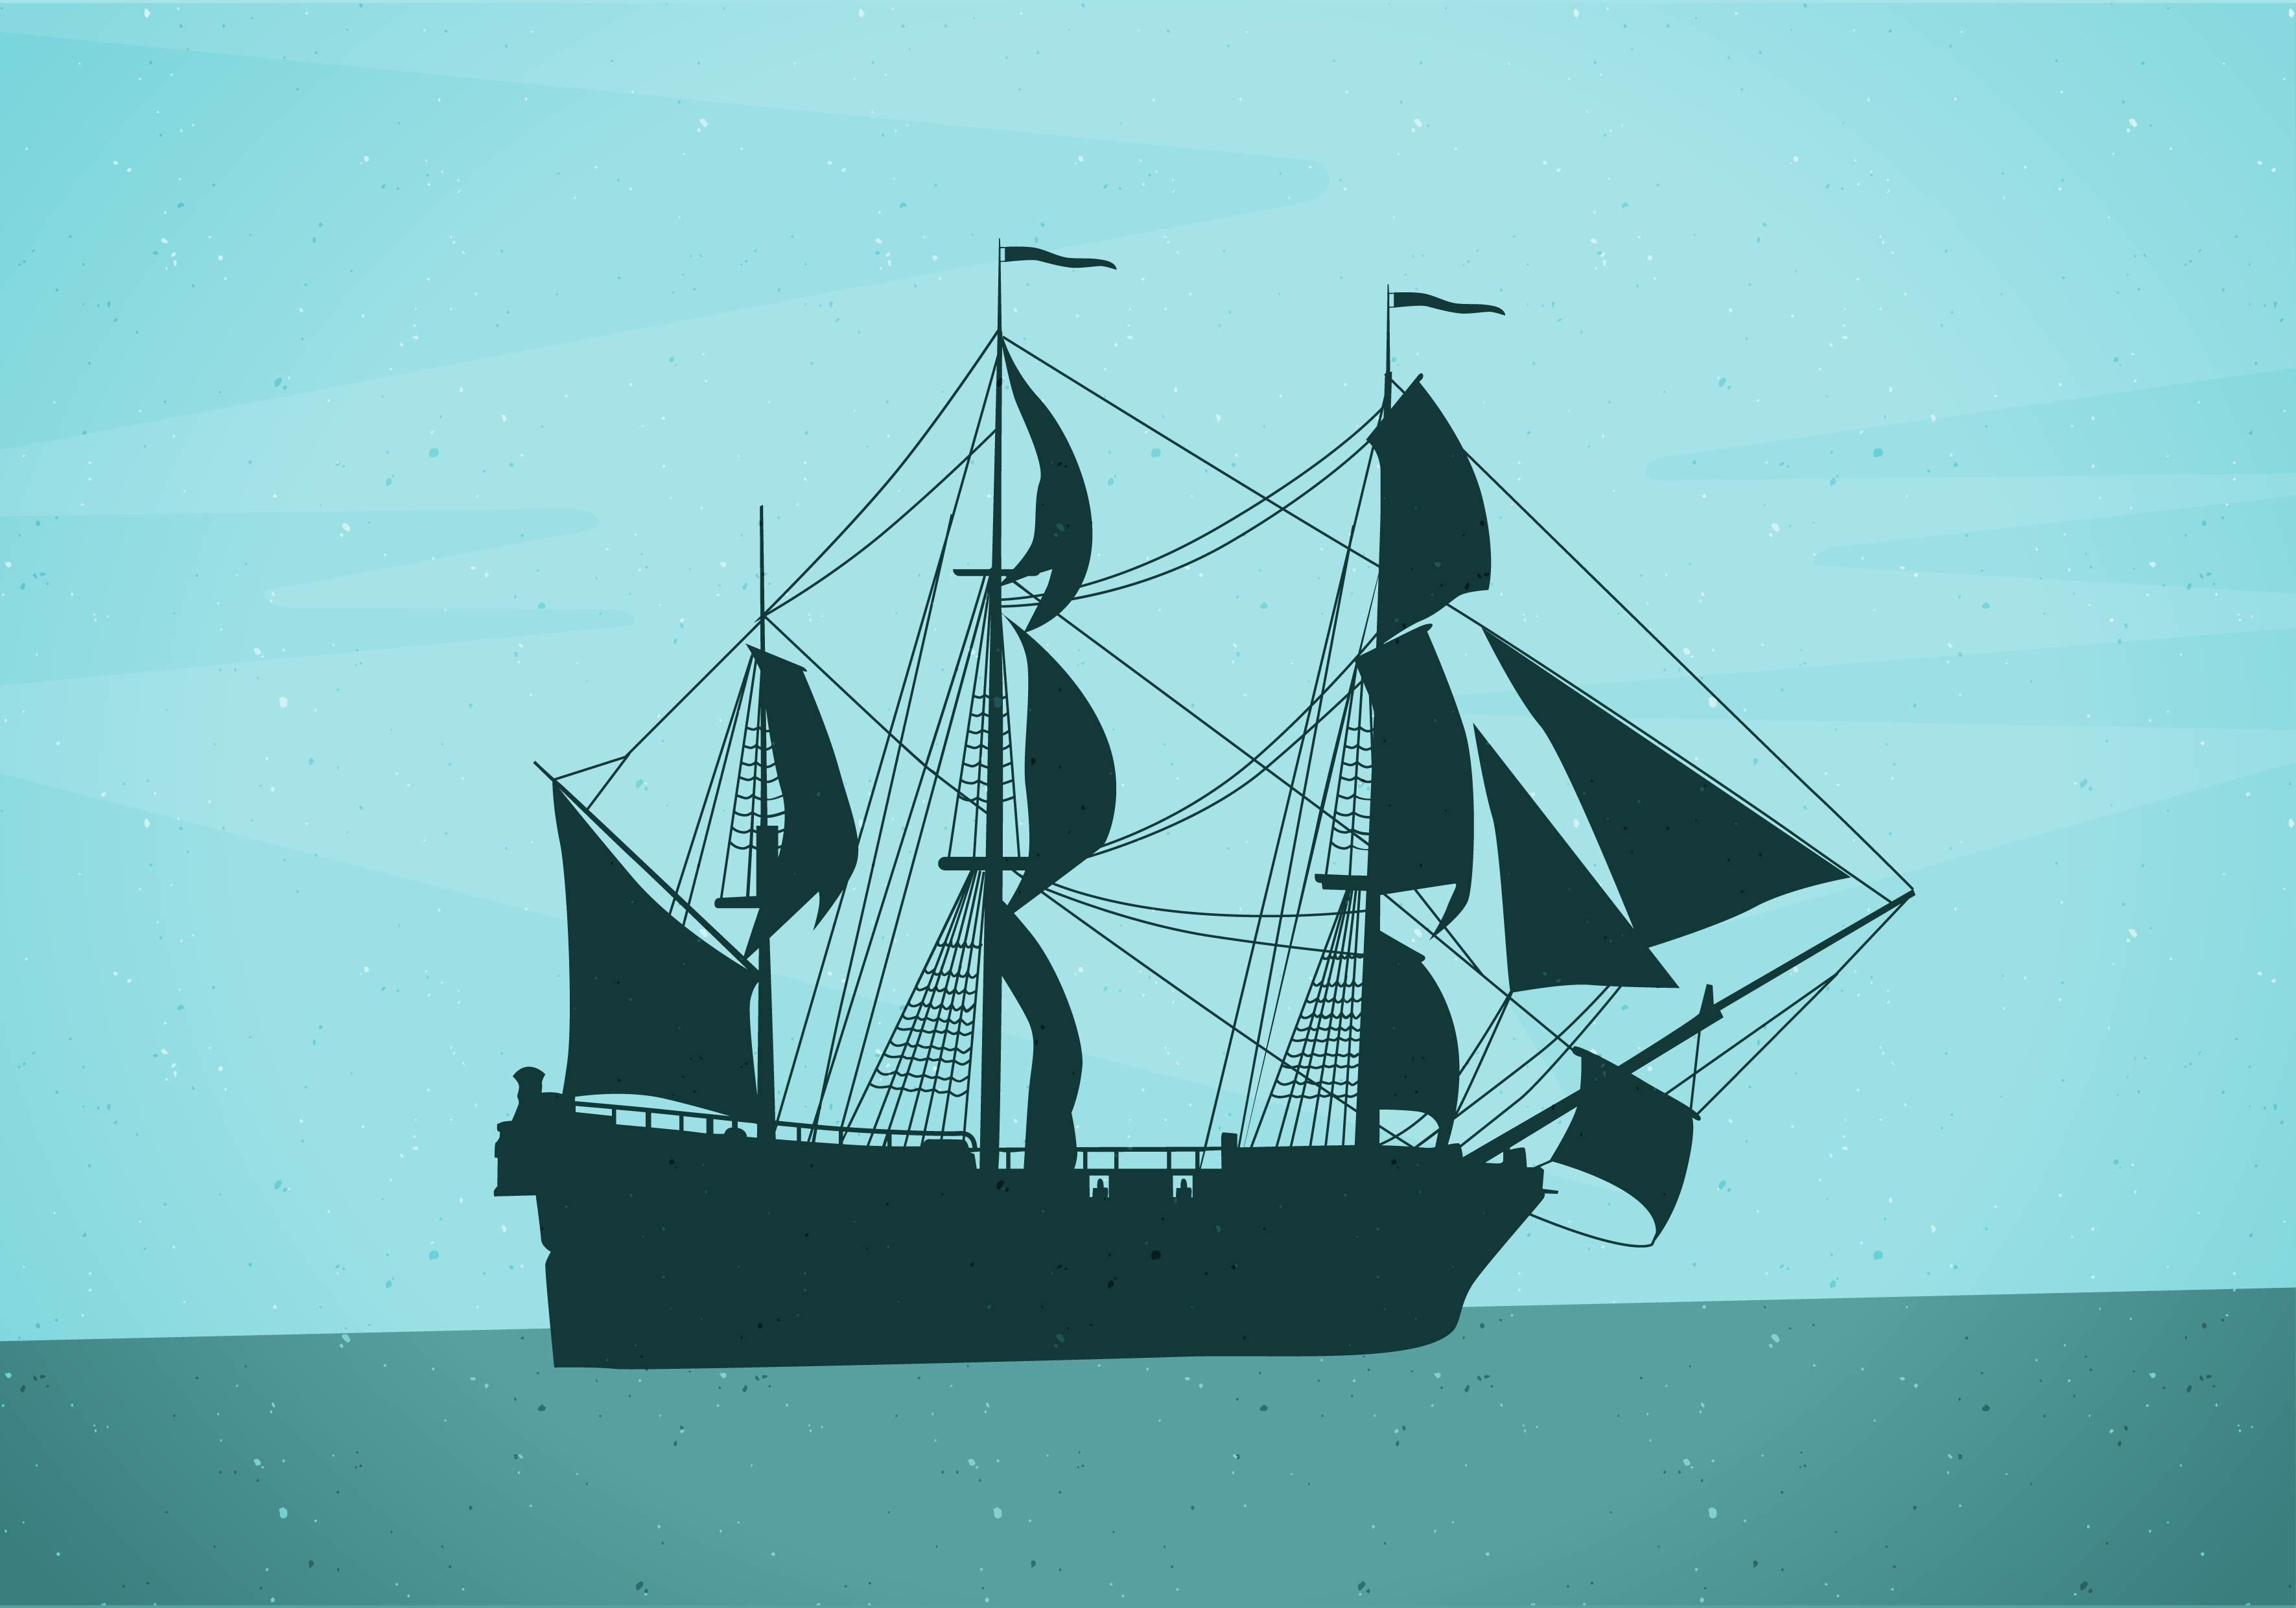 Barco pirata silueta